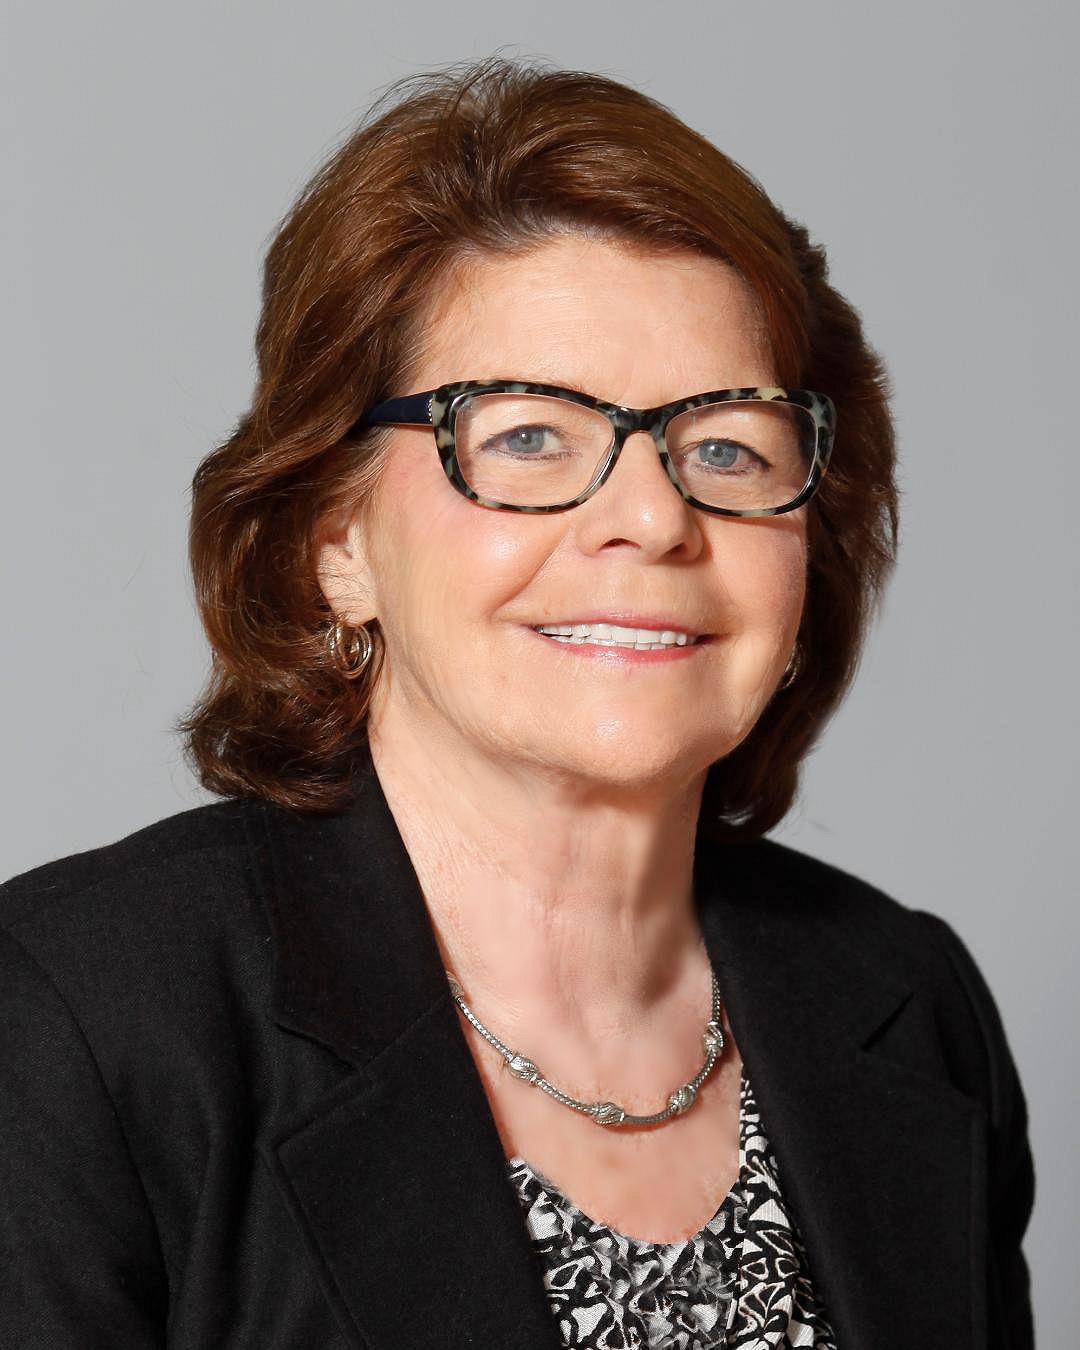 Barbara Sorrentino